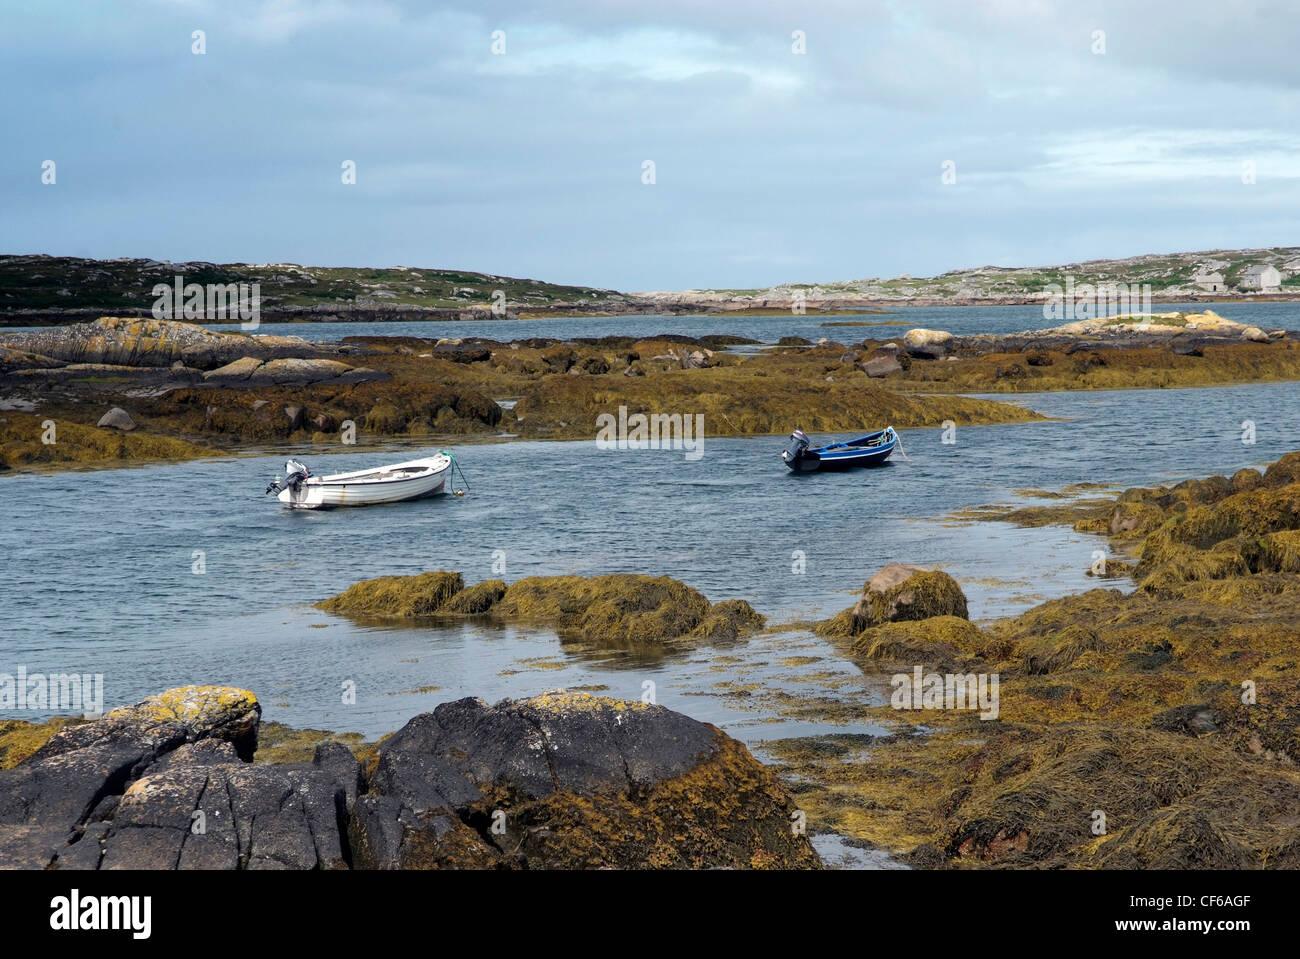 Ireland, Galway, Connemara landscape, Gaeltacht Photo by Glyn Genin - Stock Image